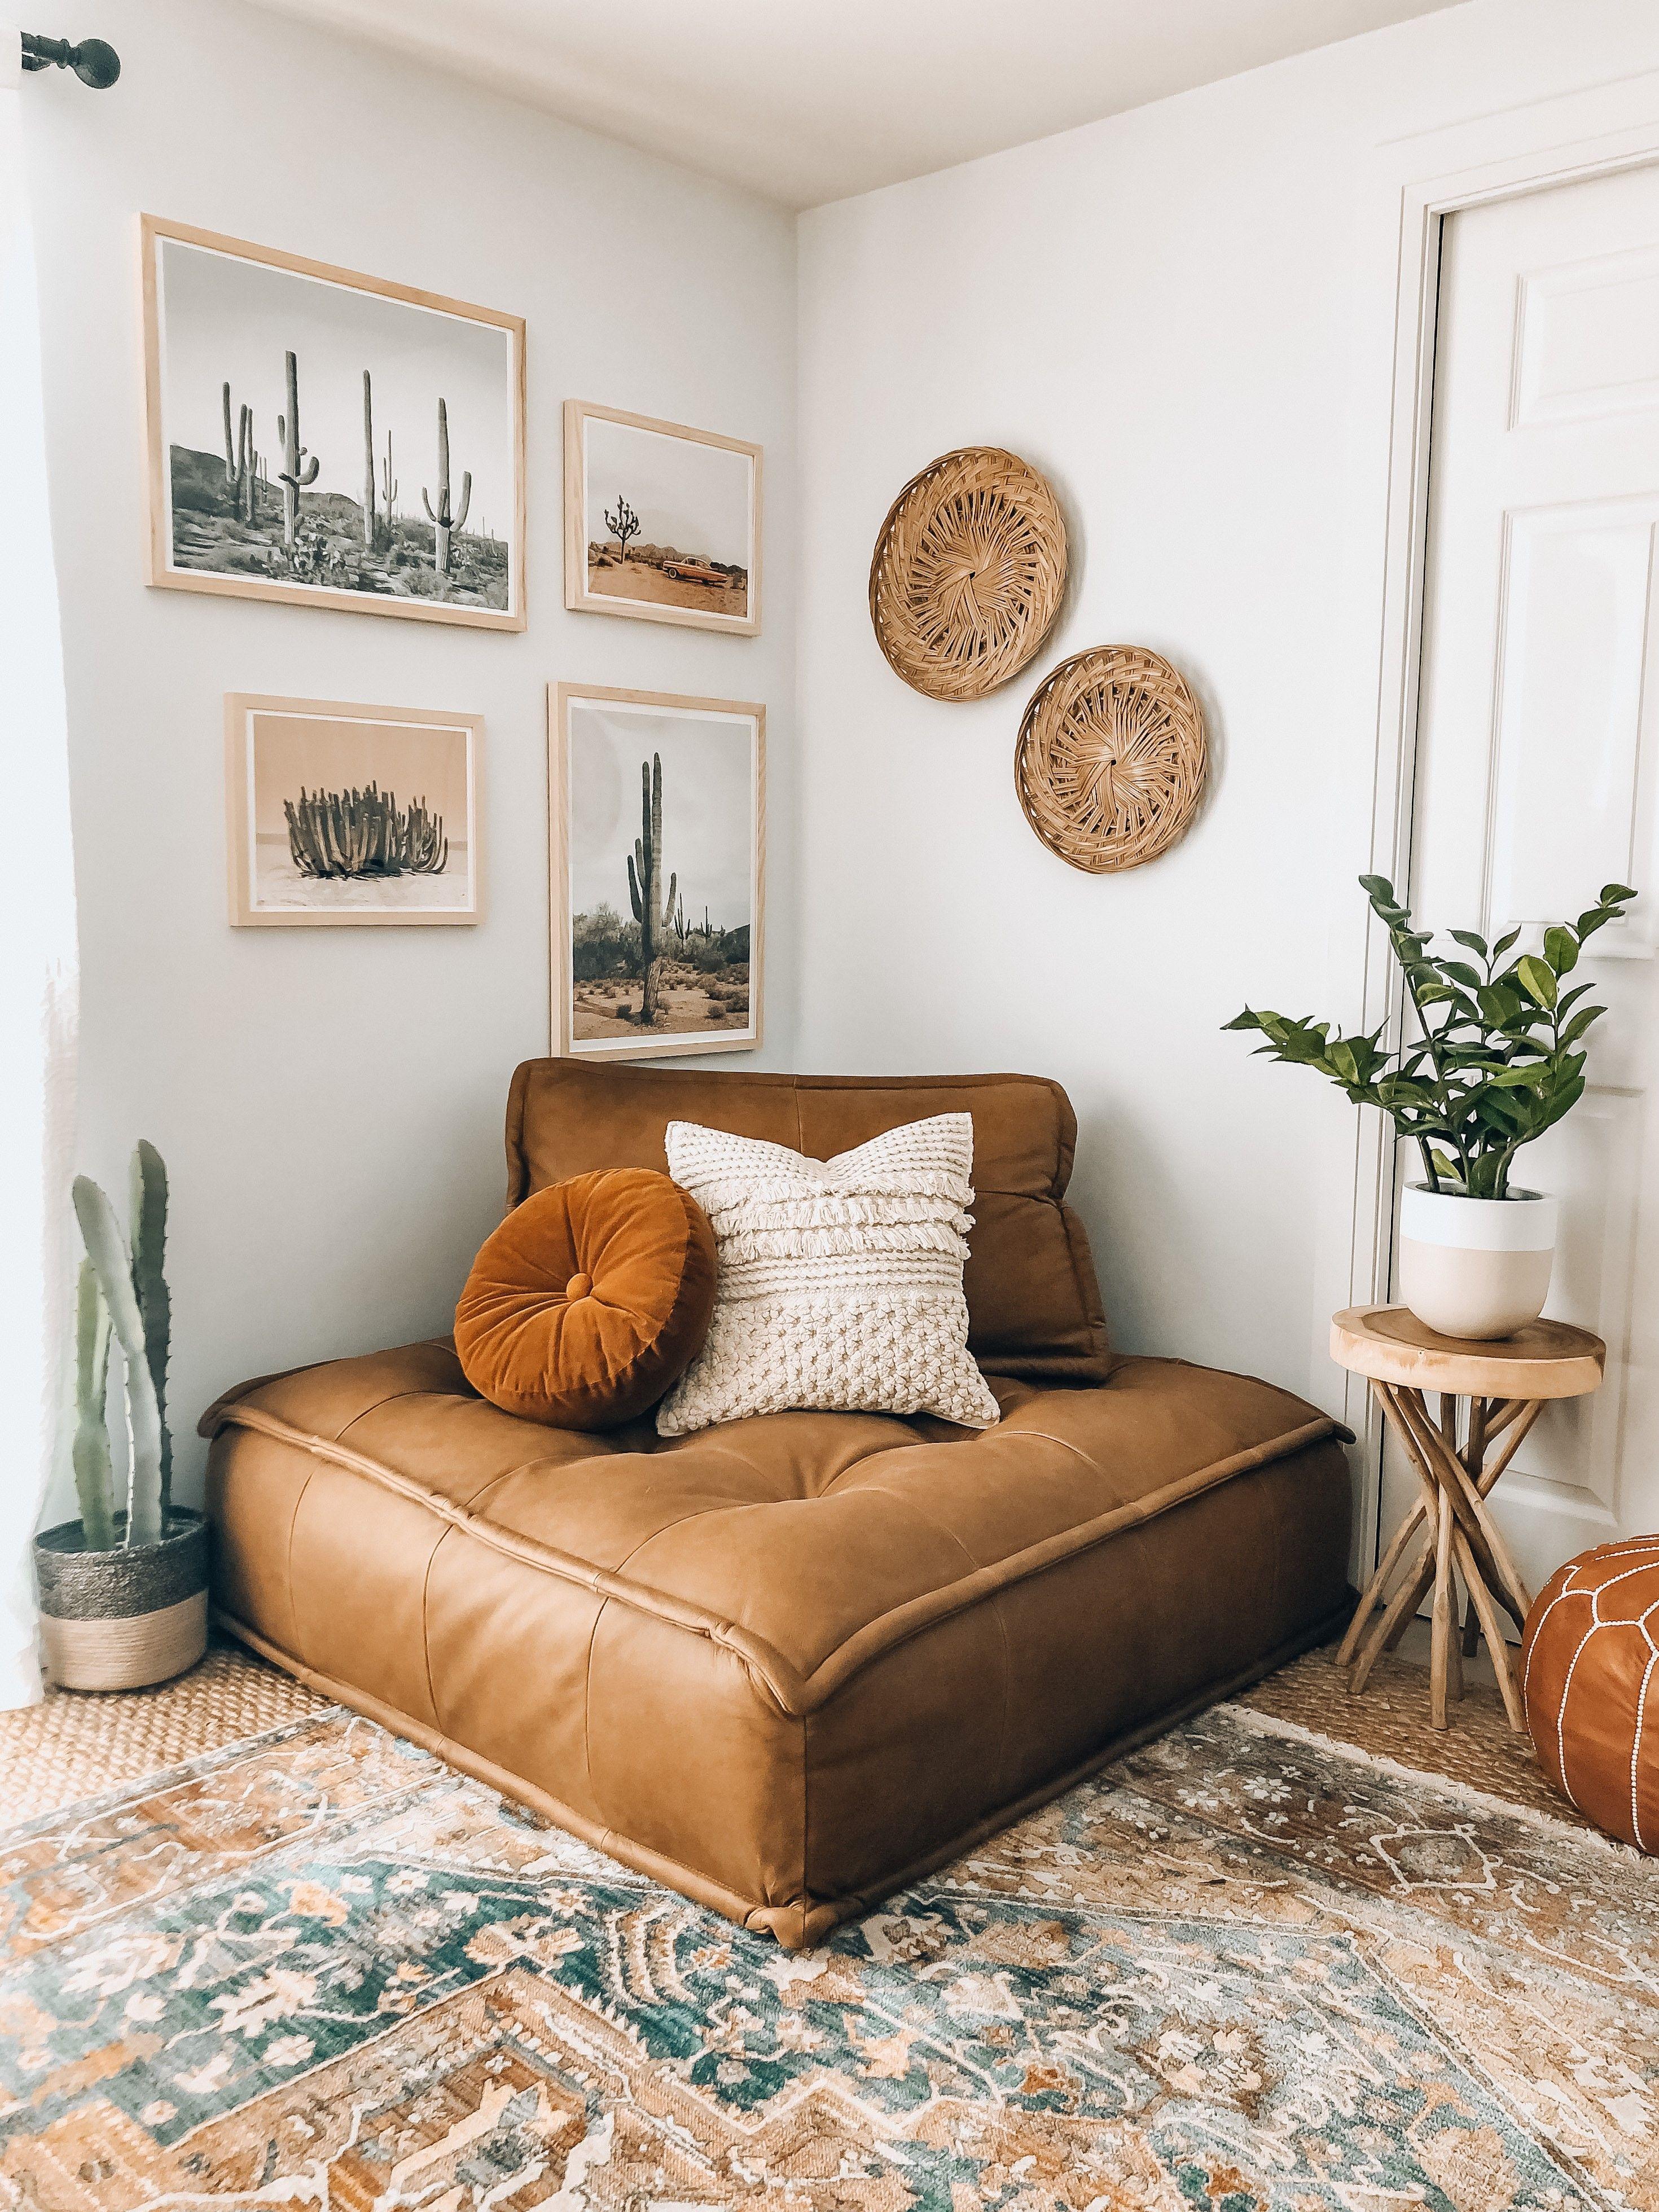 Brio Lounge Chair - Cognac Leather